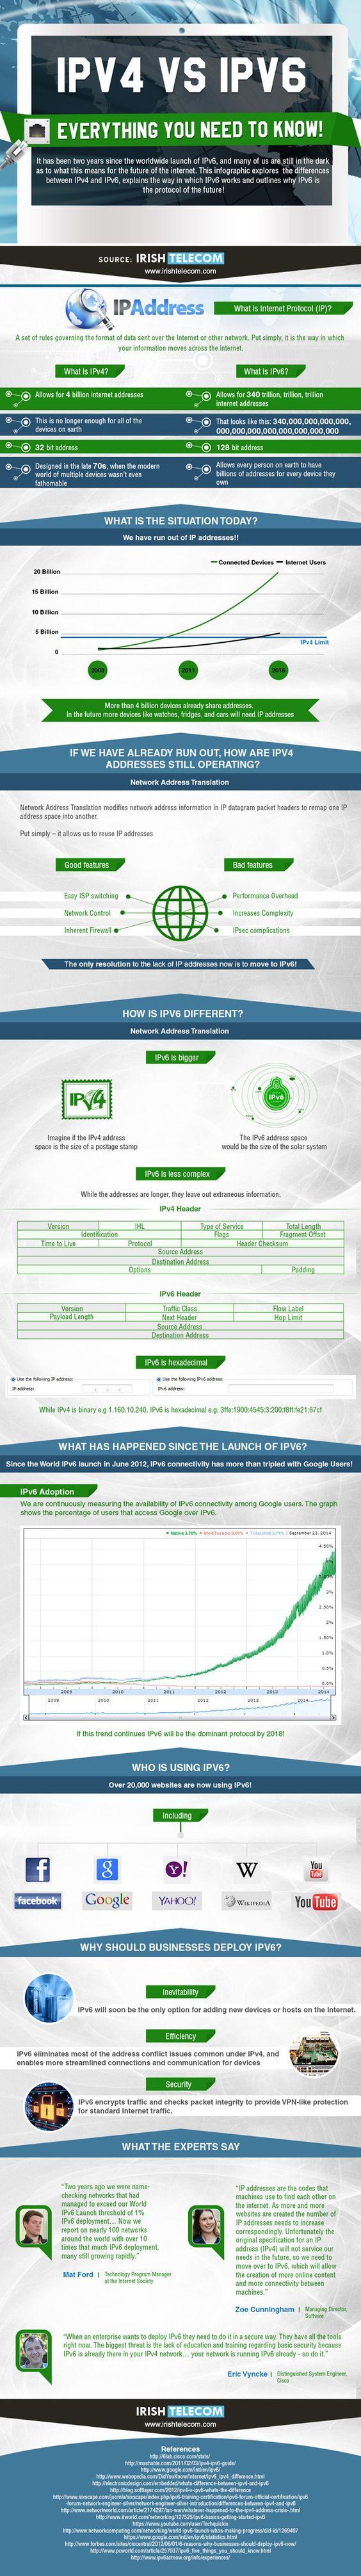 IPv4 vs. IPv6 Infographic